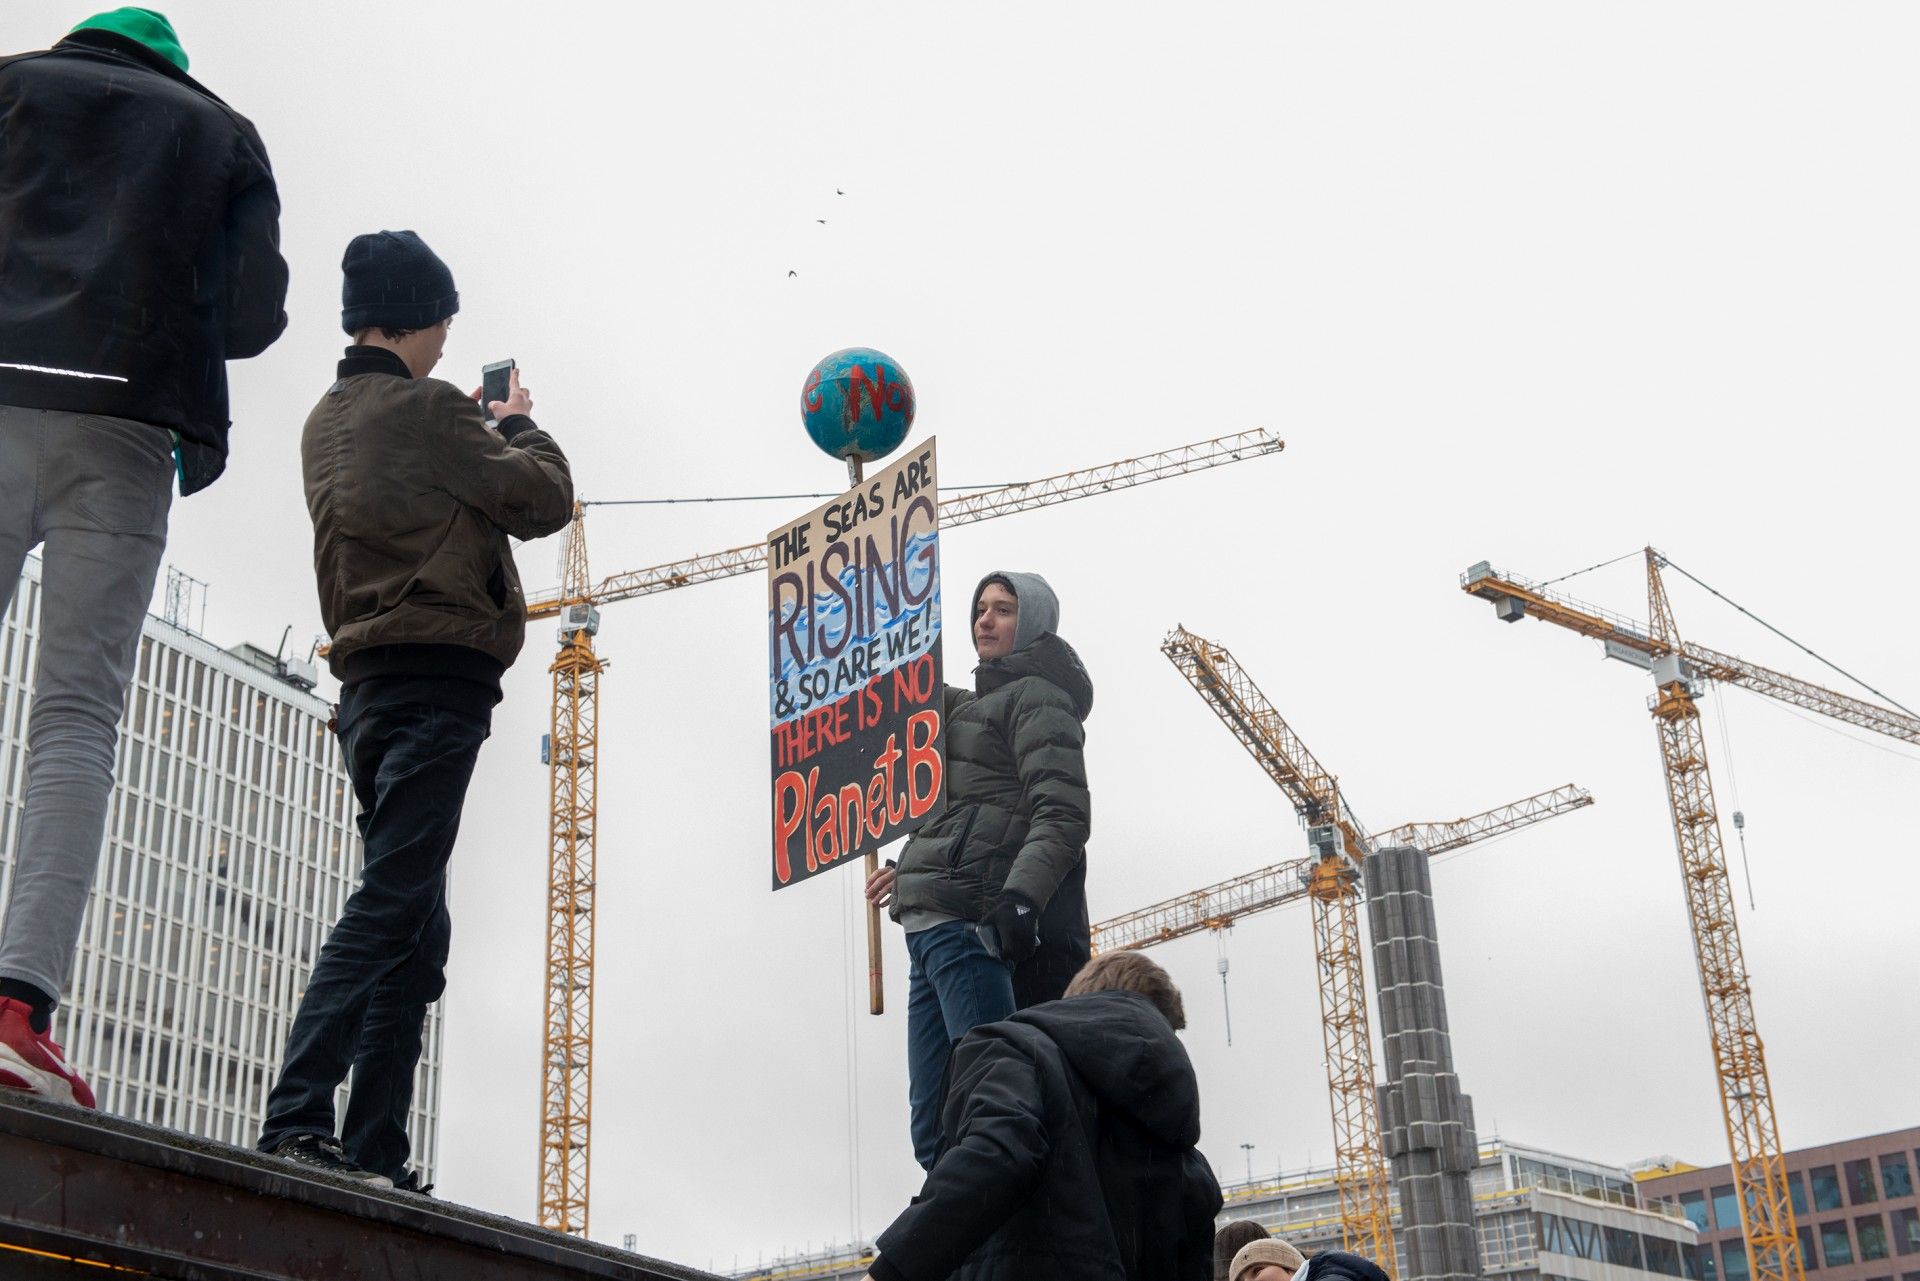 Demonstration in Stockholm. Photo: Nordiska museet